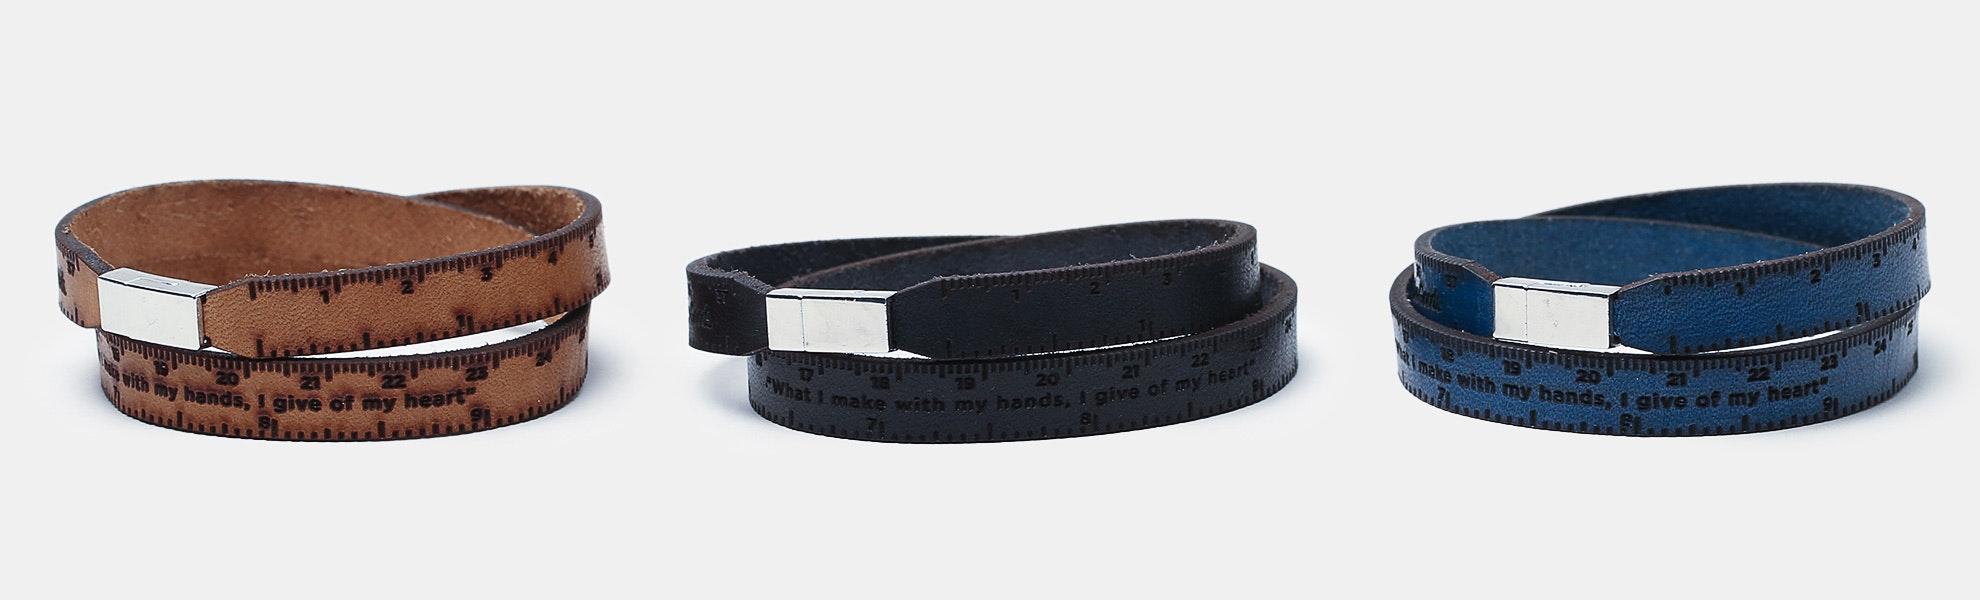 Wrist Ruler Bracelet